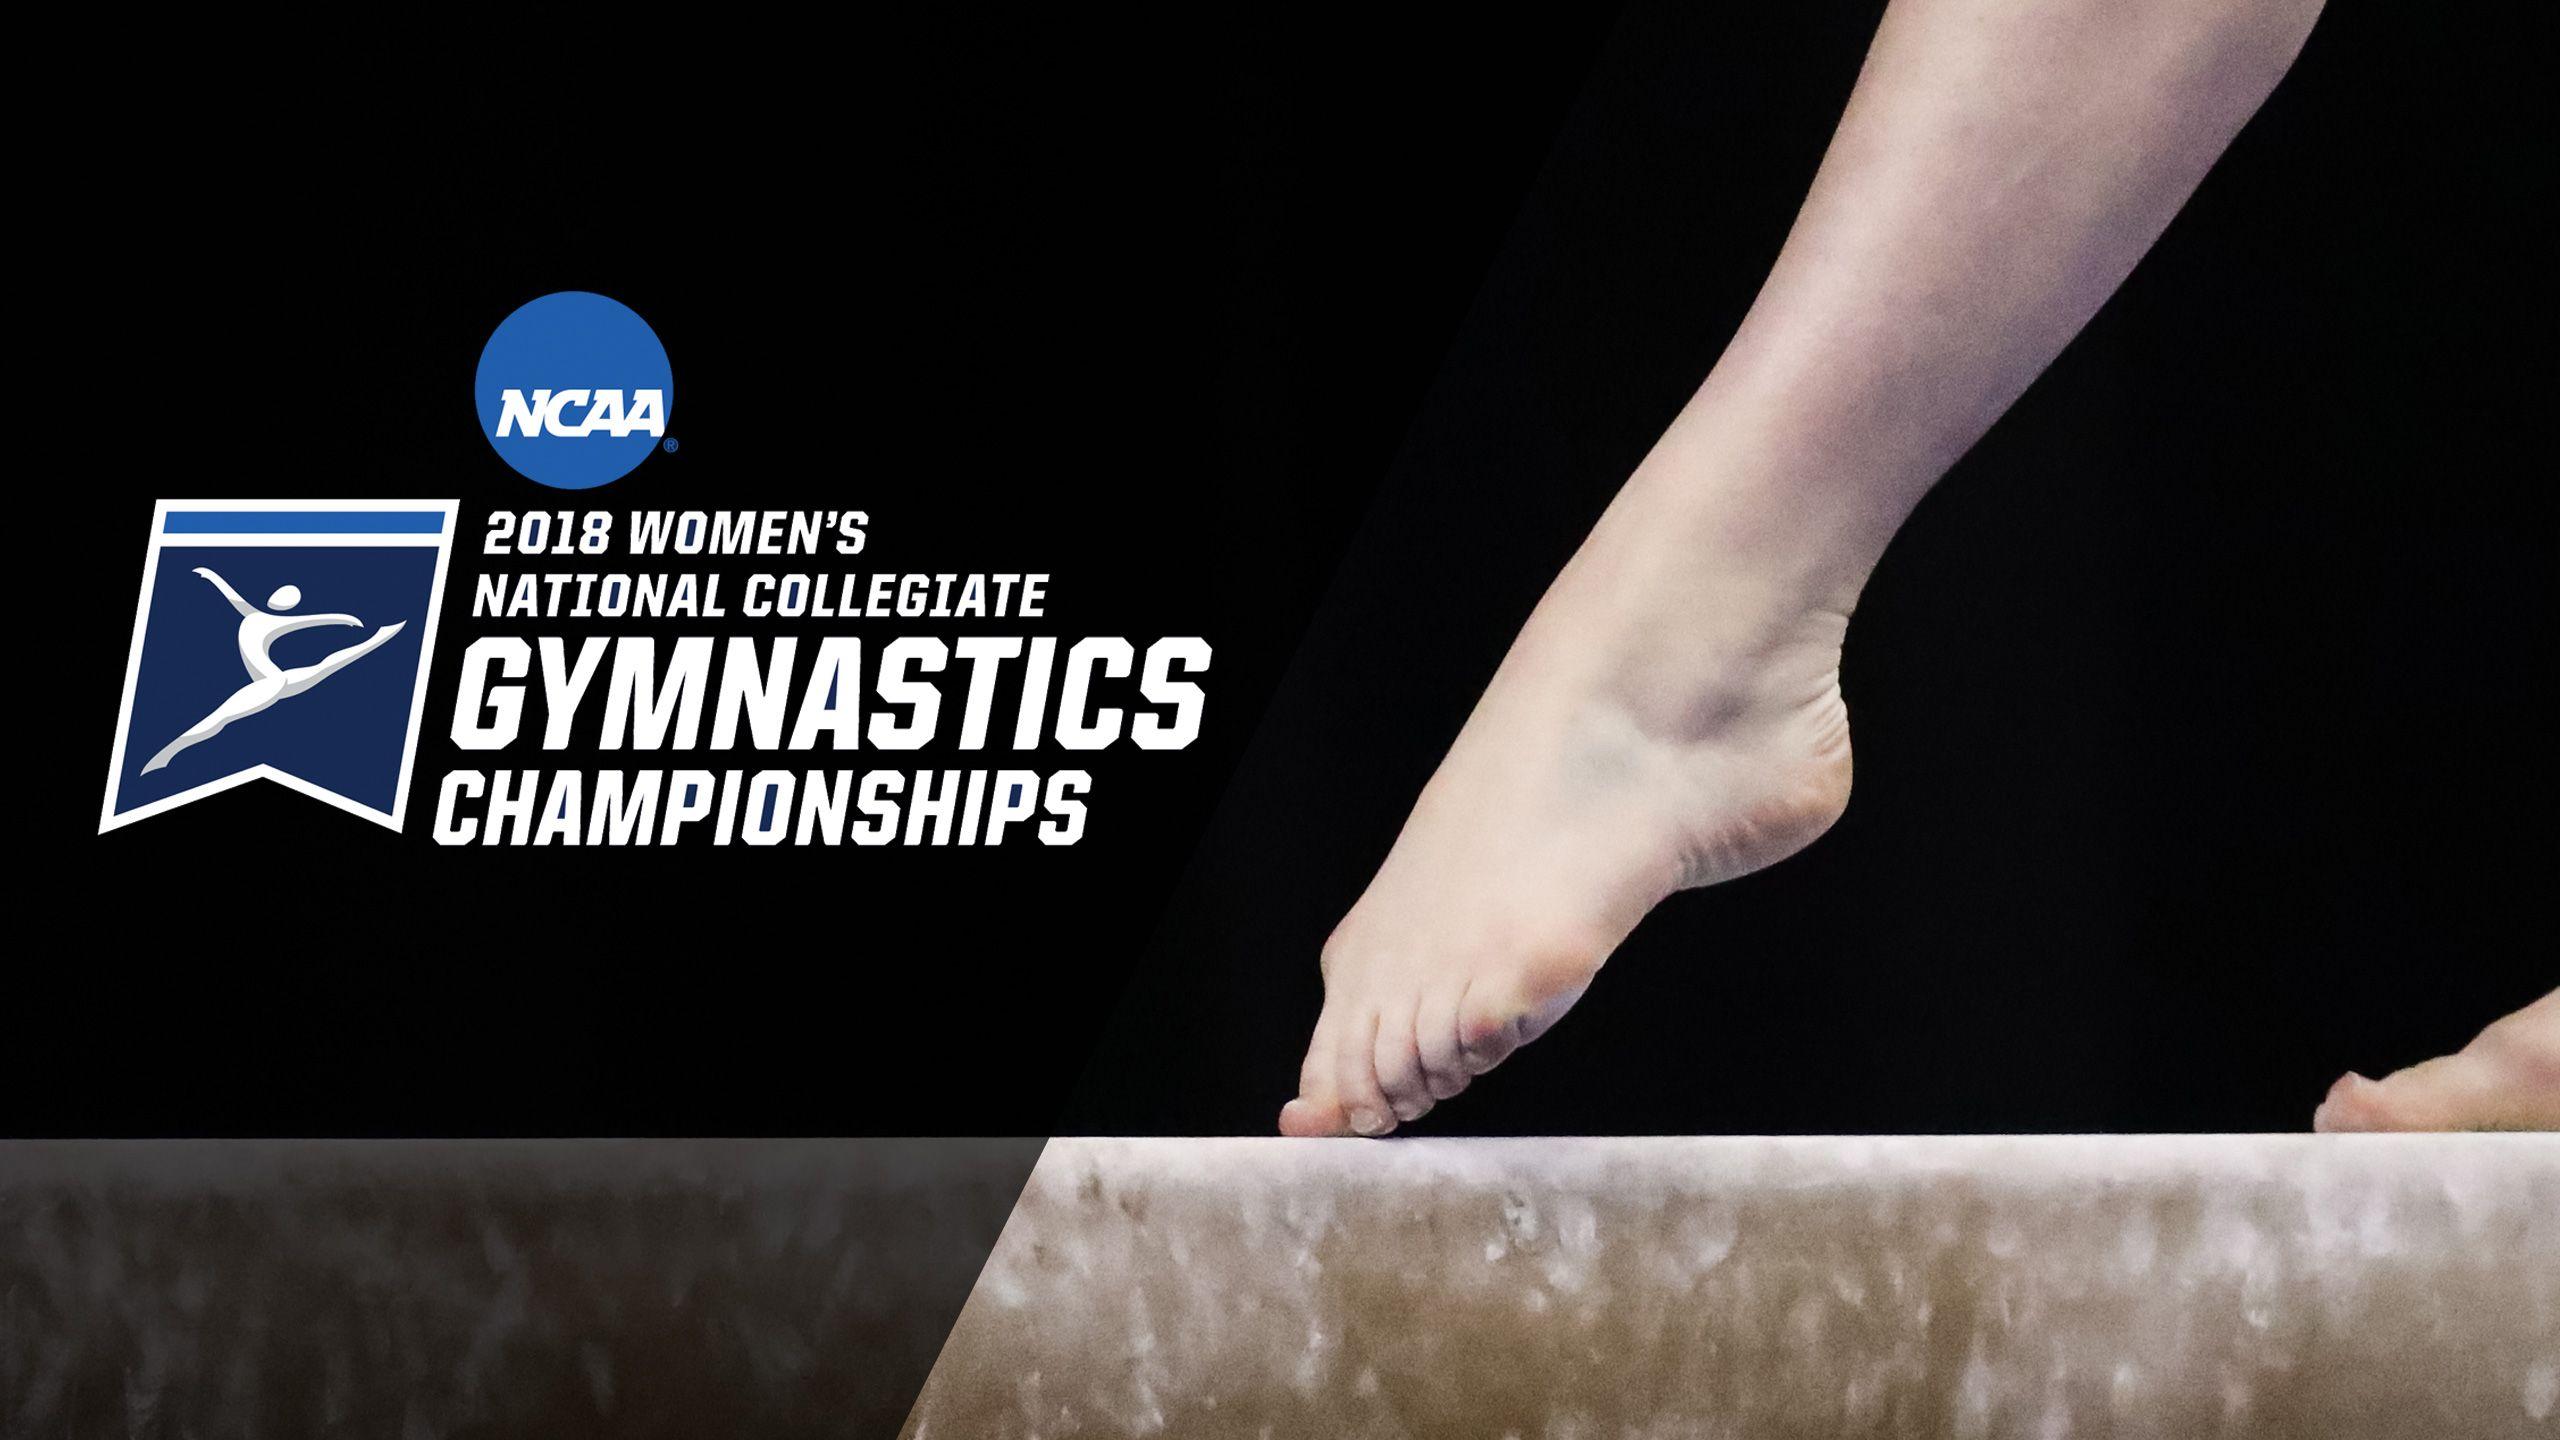 NCAA Regional Championships (Championship)